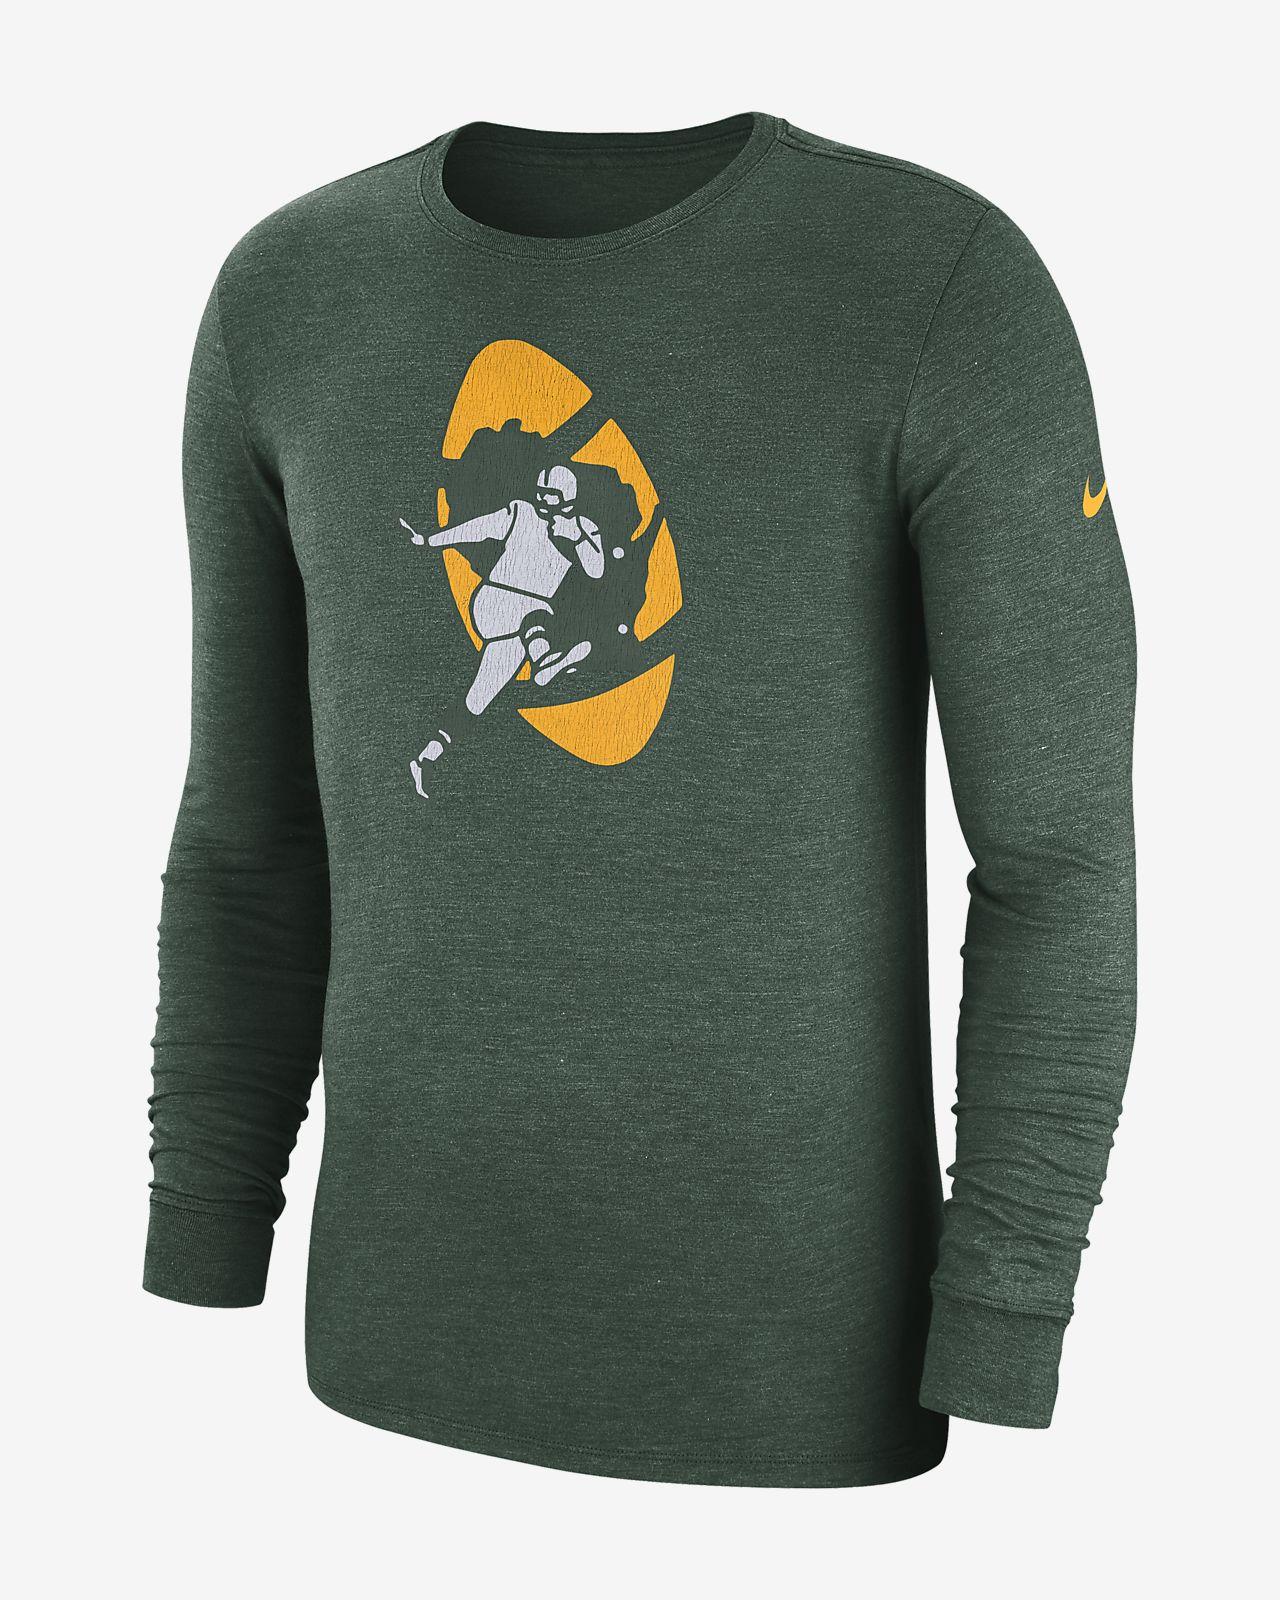 Мужская футболка из трехкомпонентной ткани с длинным рукавом Nike (NFL Packers)